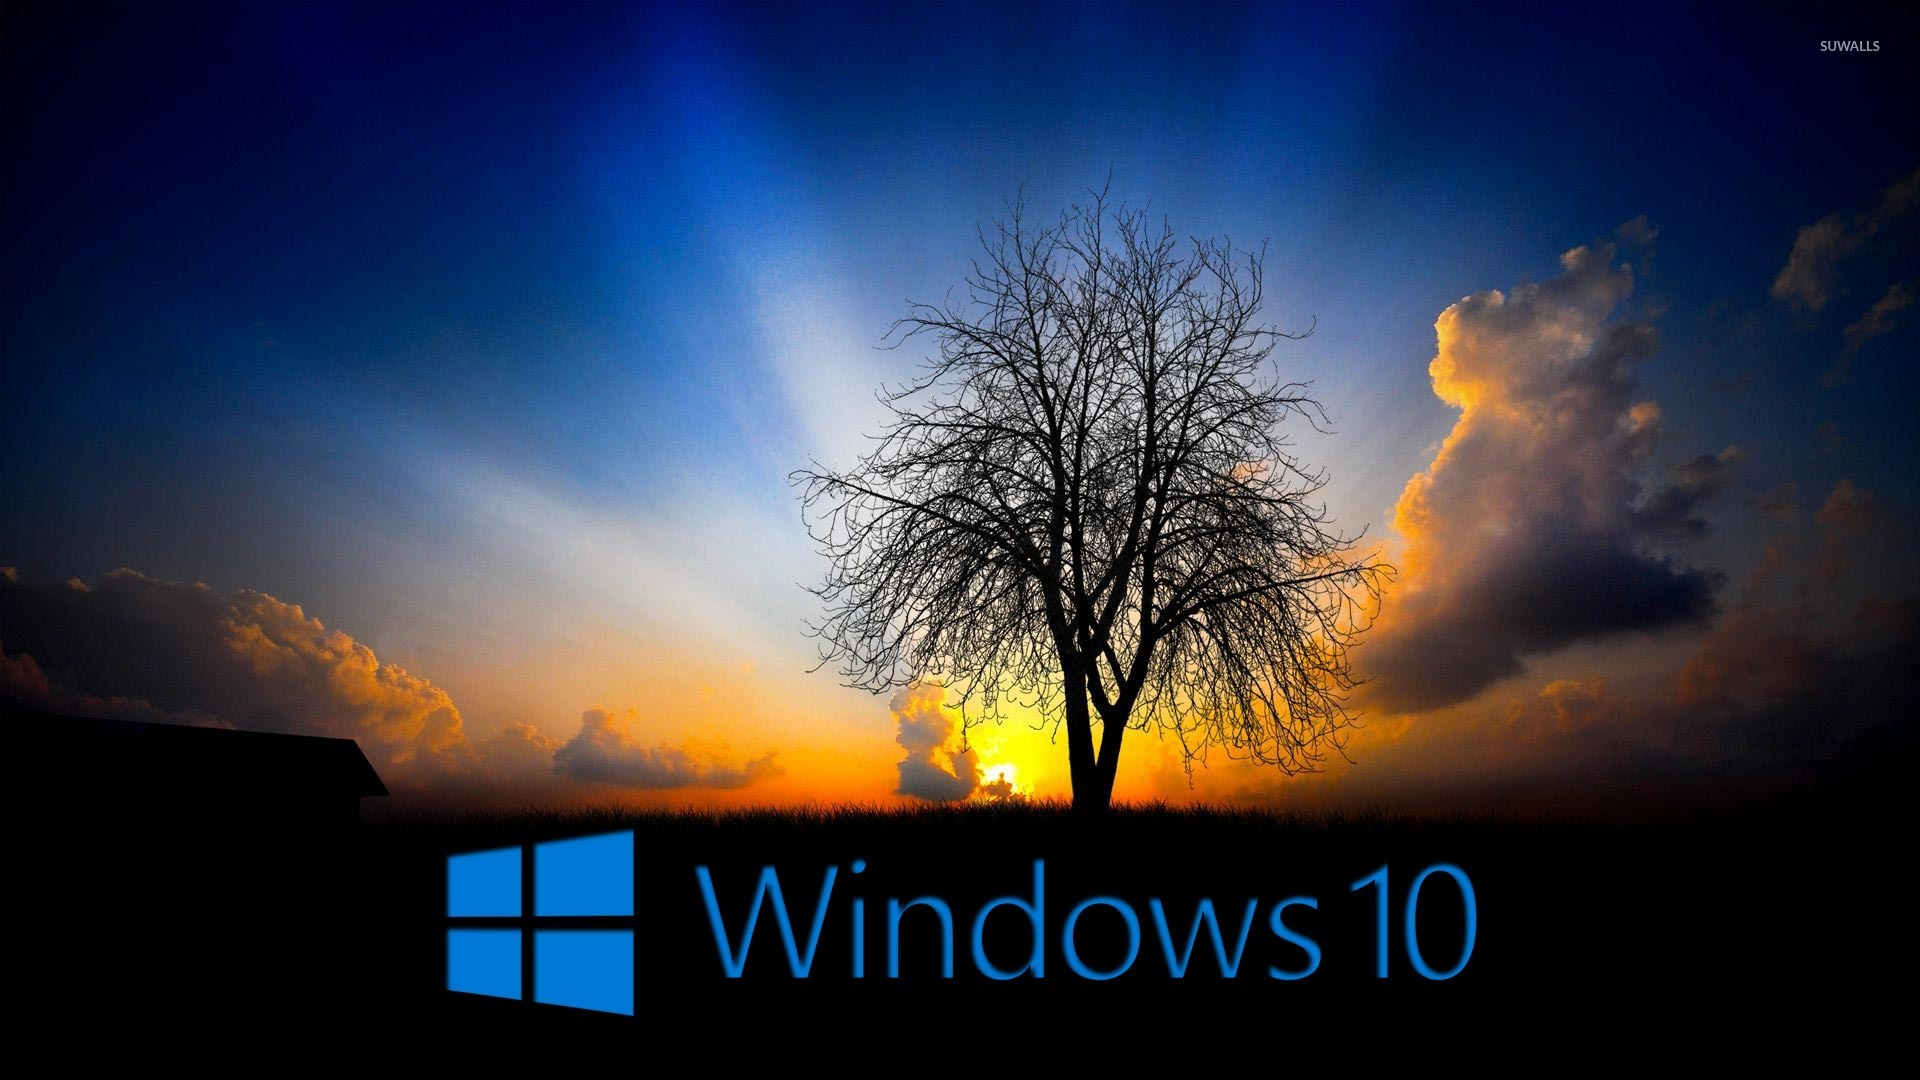 Windows 10 in the twilight wallpaper - Computer wallpapers - #48476